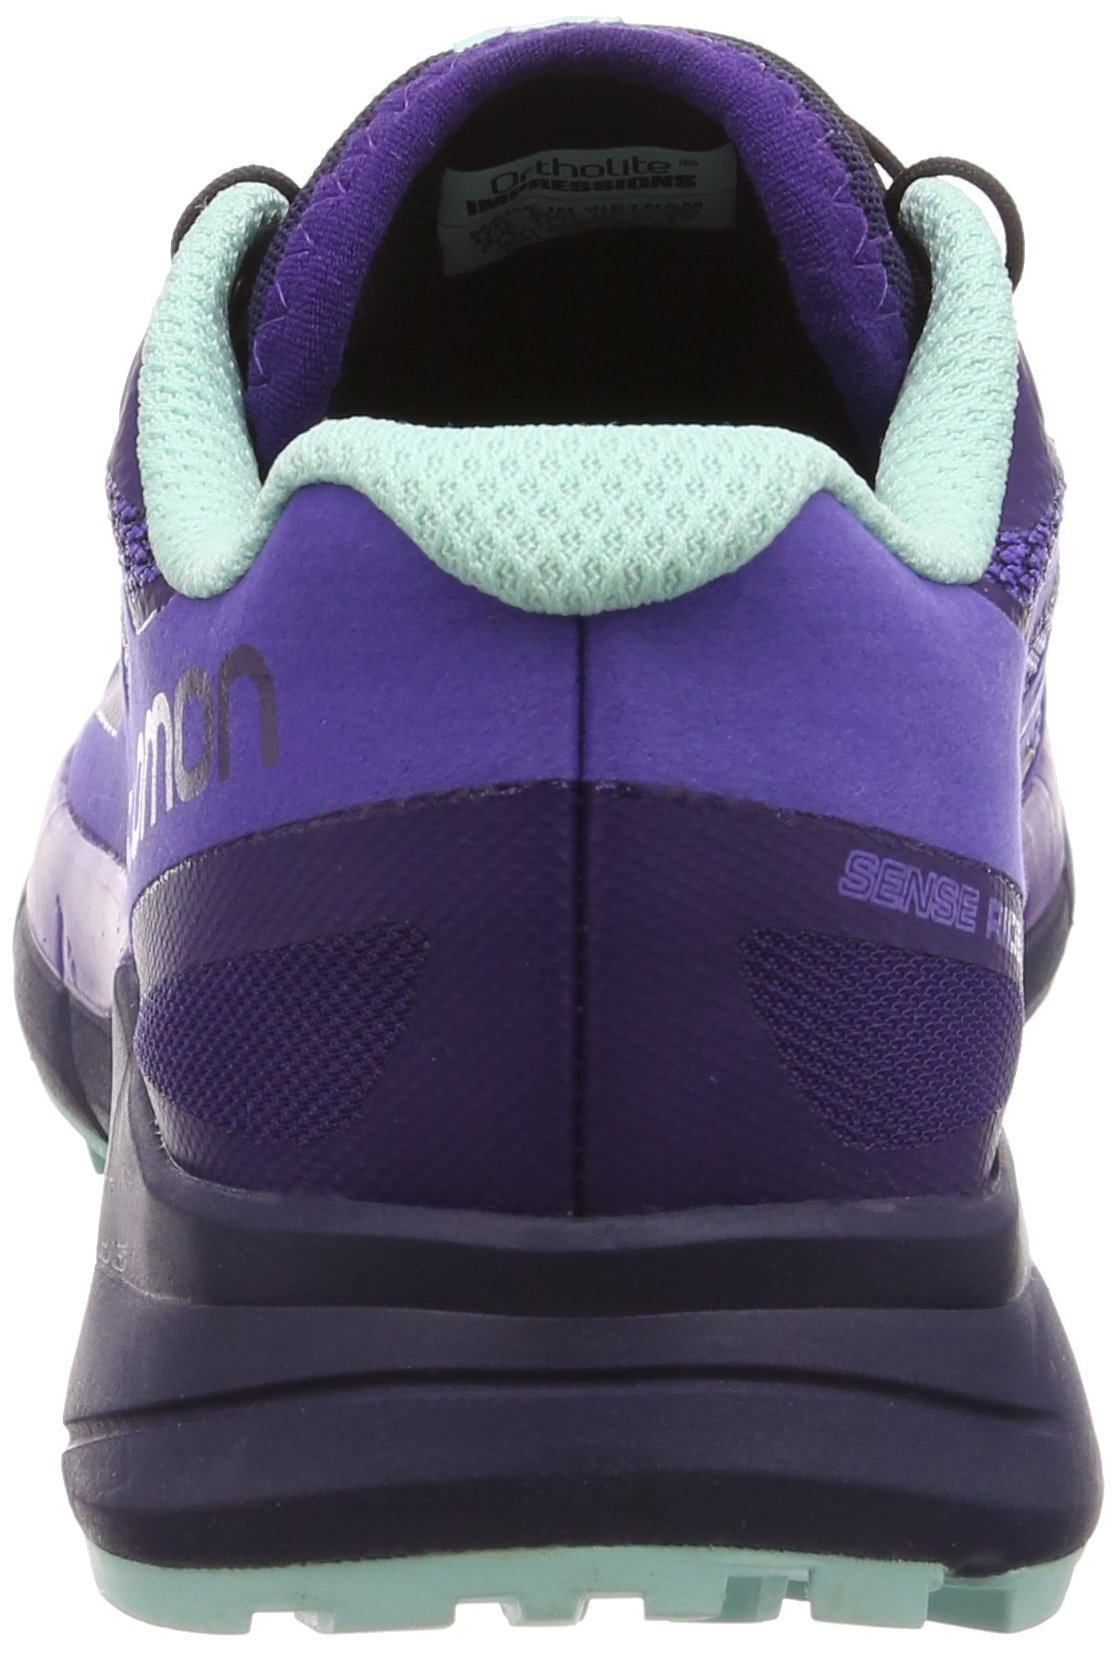 Salomon Women's Sense Ride Running Shoes, Purple, 6.5 M by Salomon (Image #2)